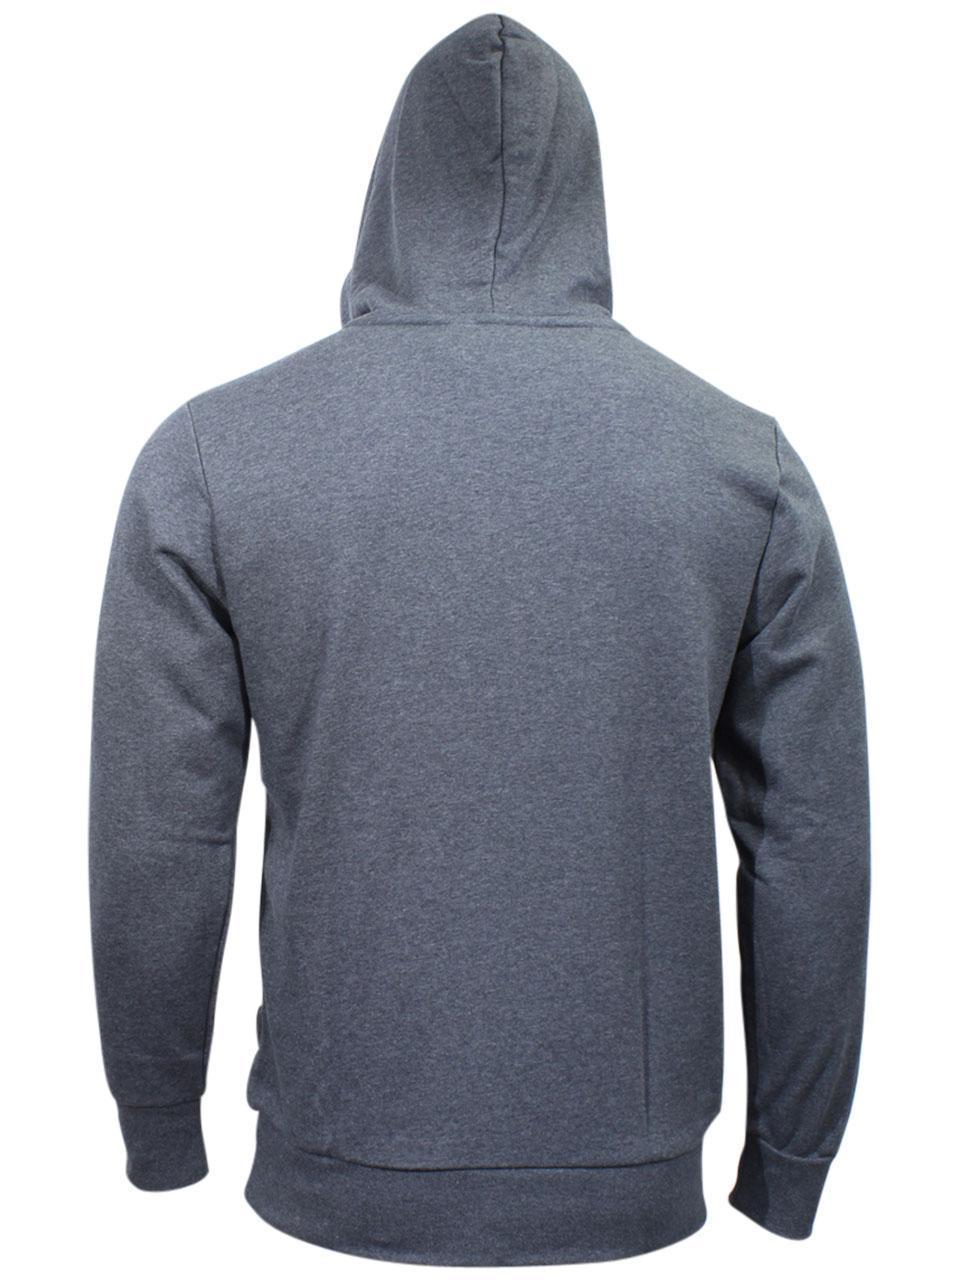 4794bcc775 Details about Adidas Men's Essentials Linear Logo Pullover Hoodie Sweatshirt